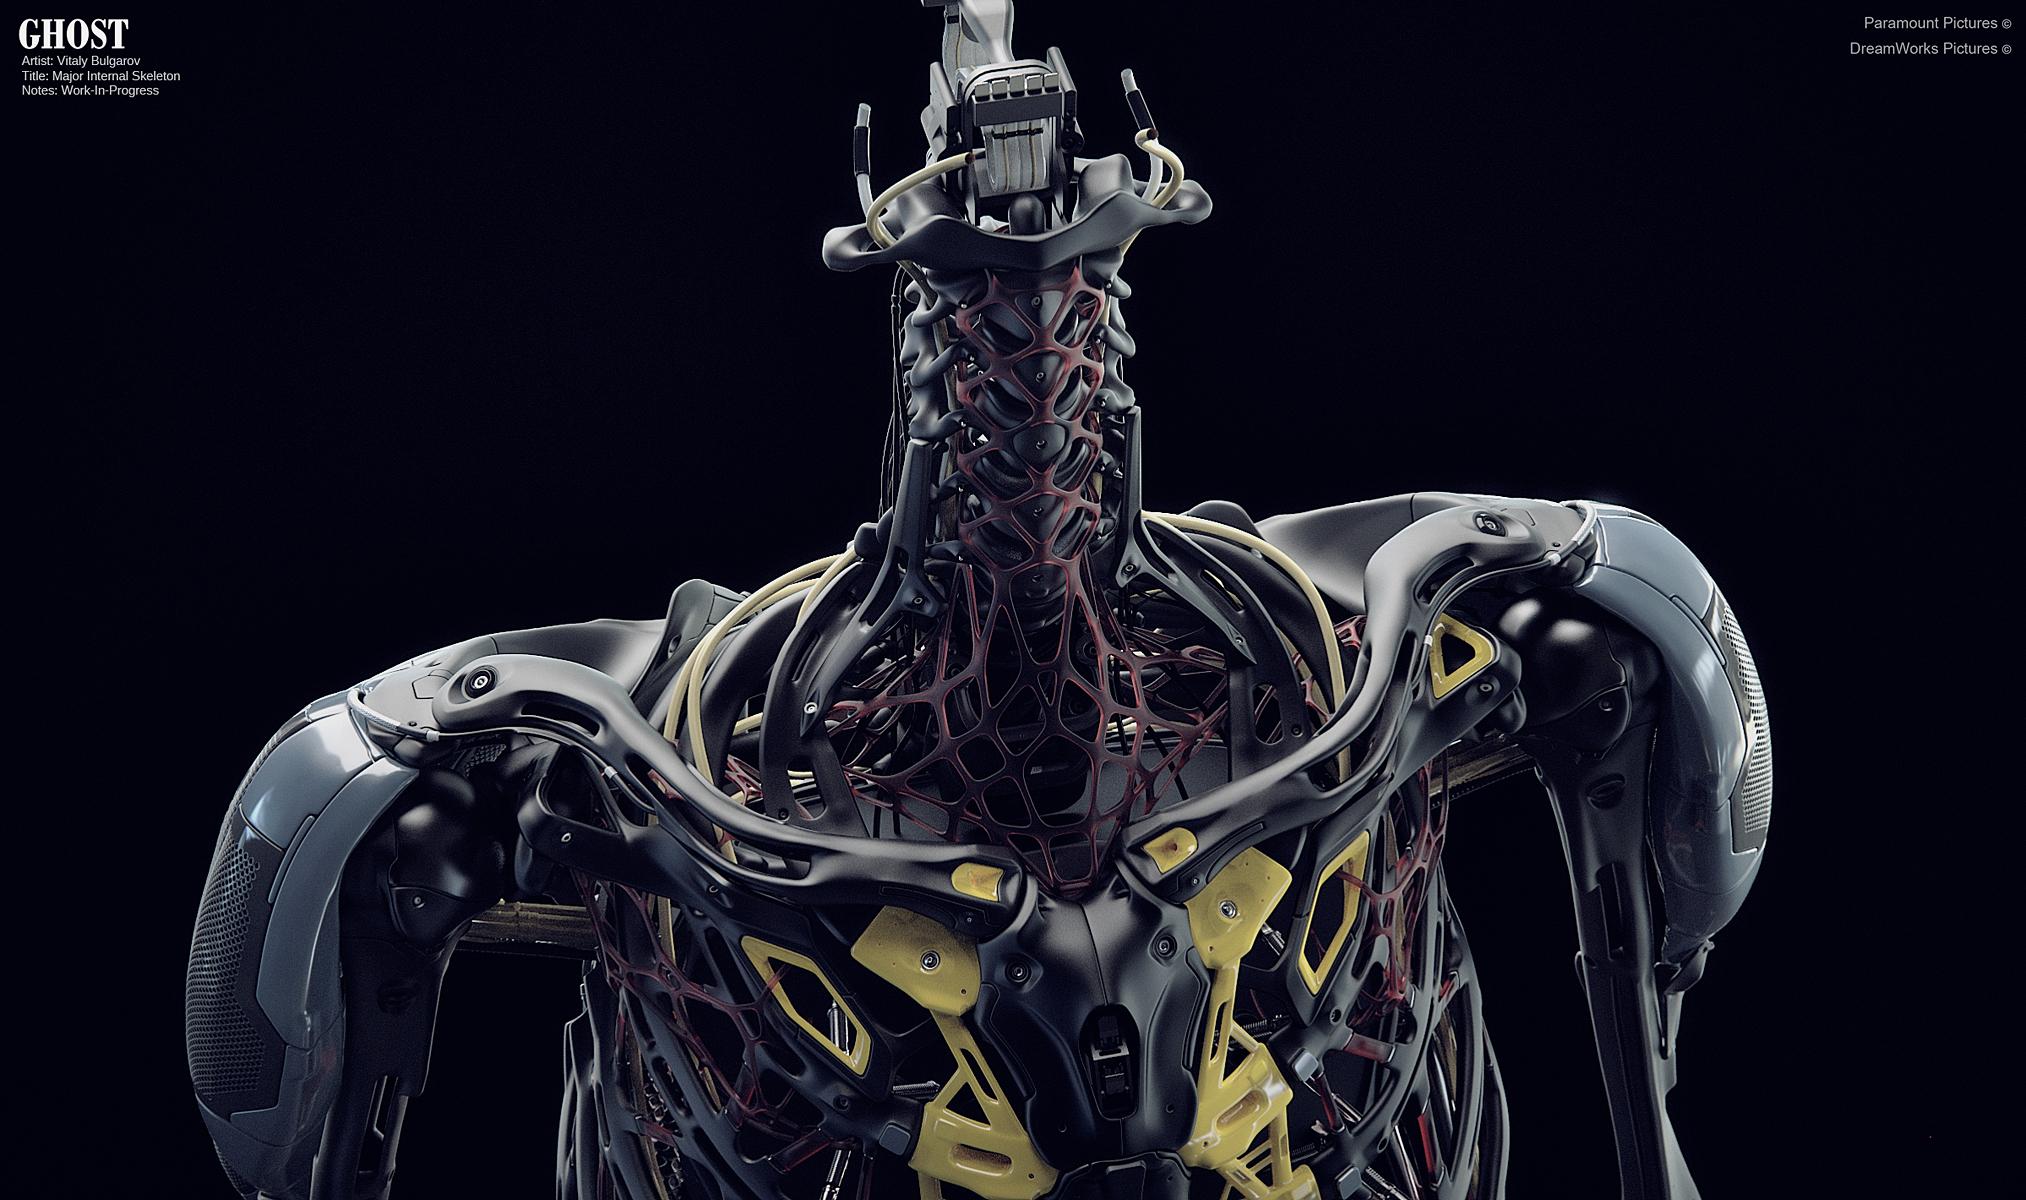 Ghost_MajorSkeleton_07-06-2015_02.jpg